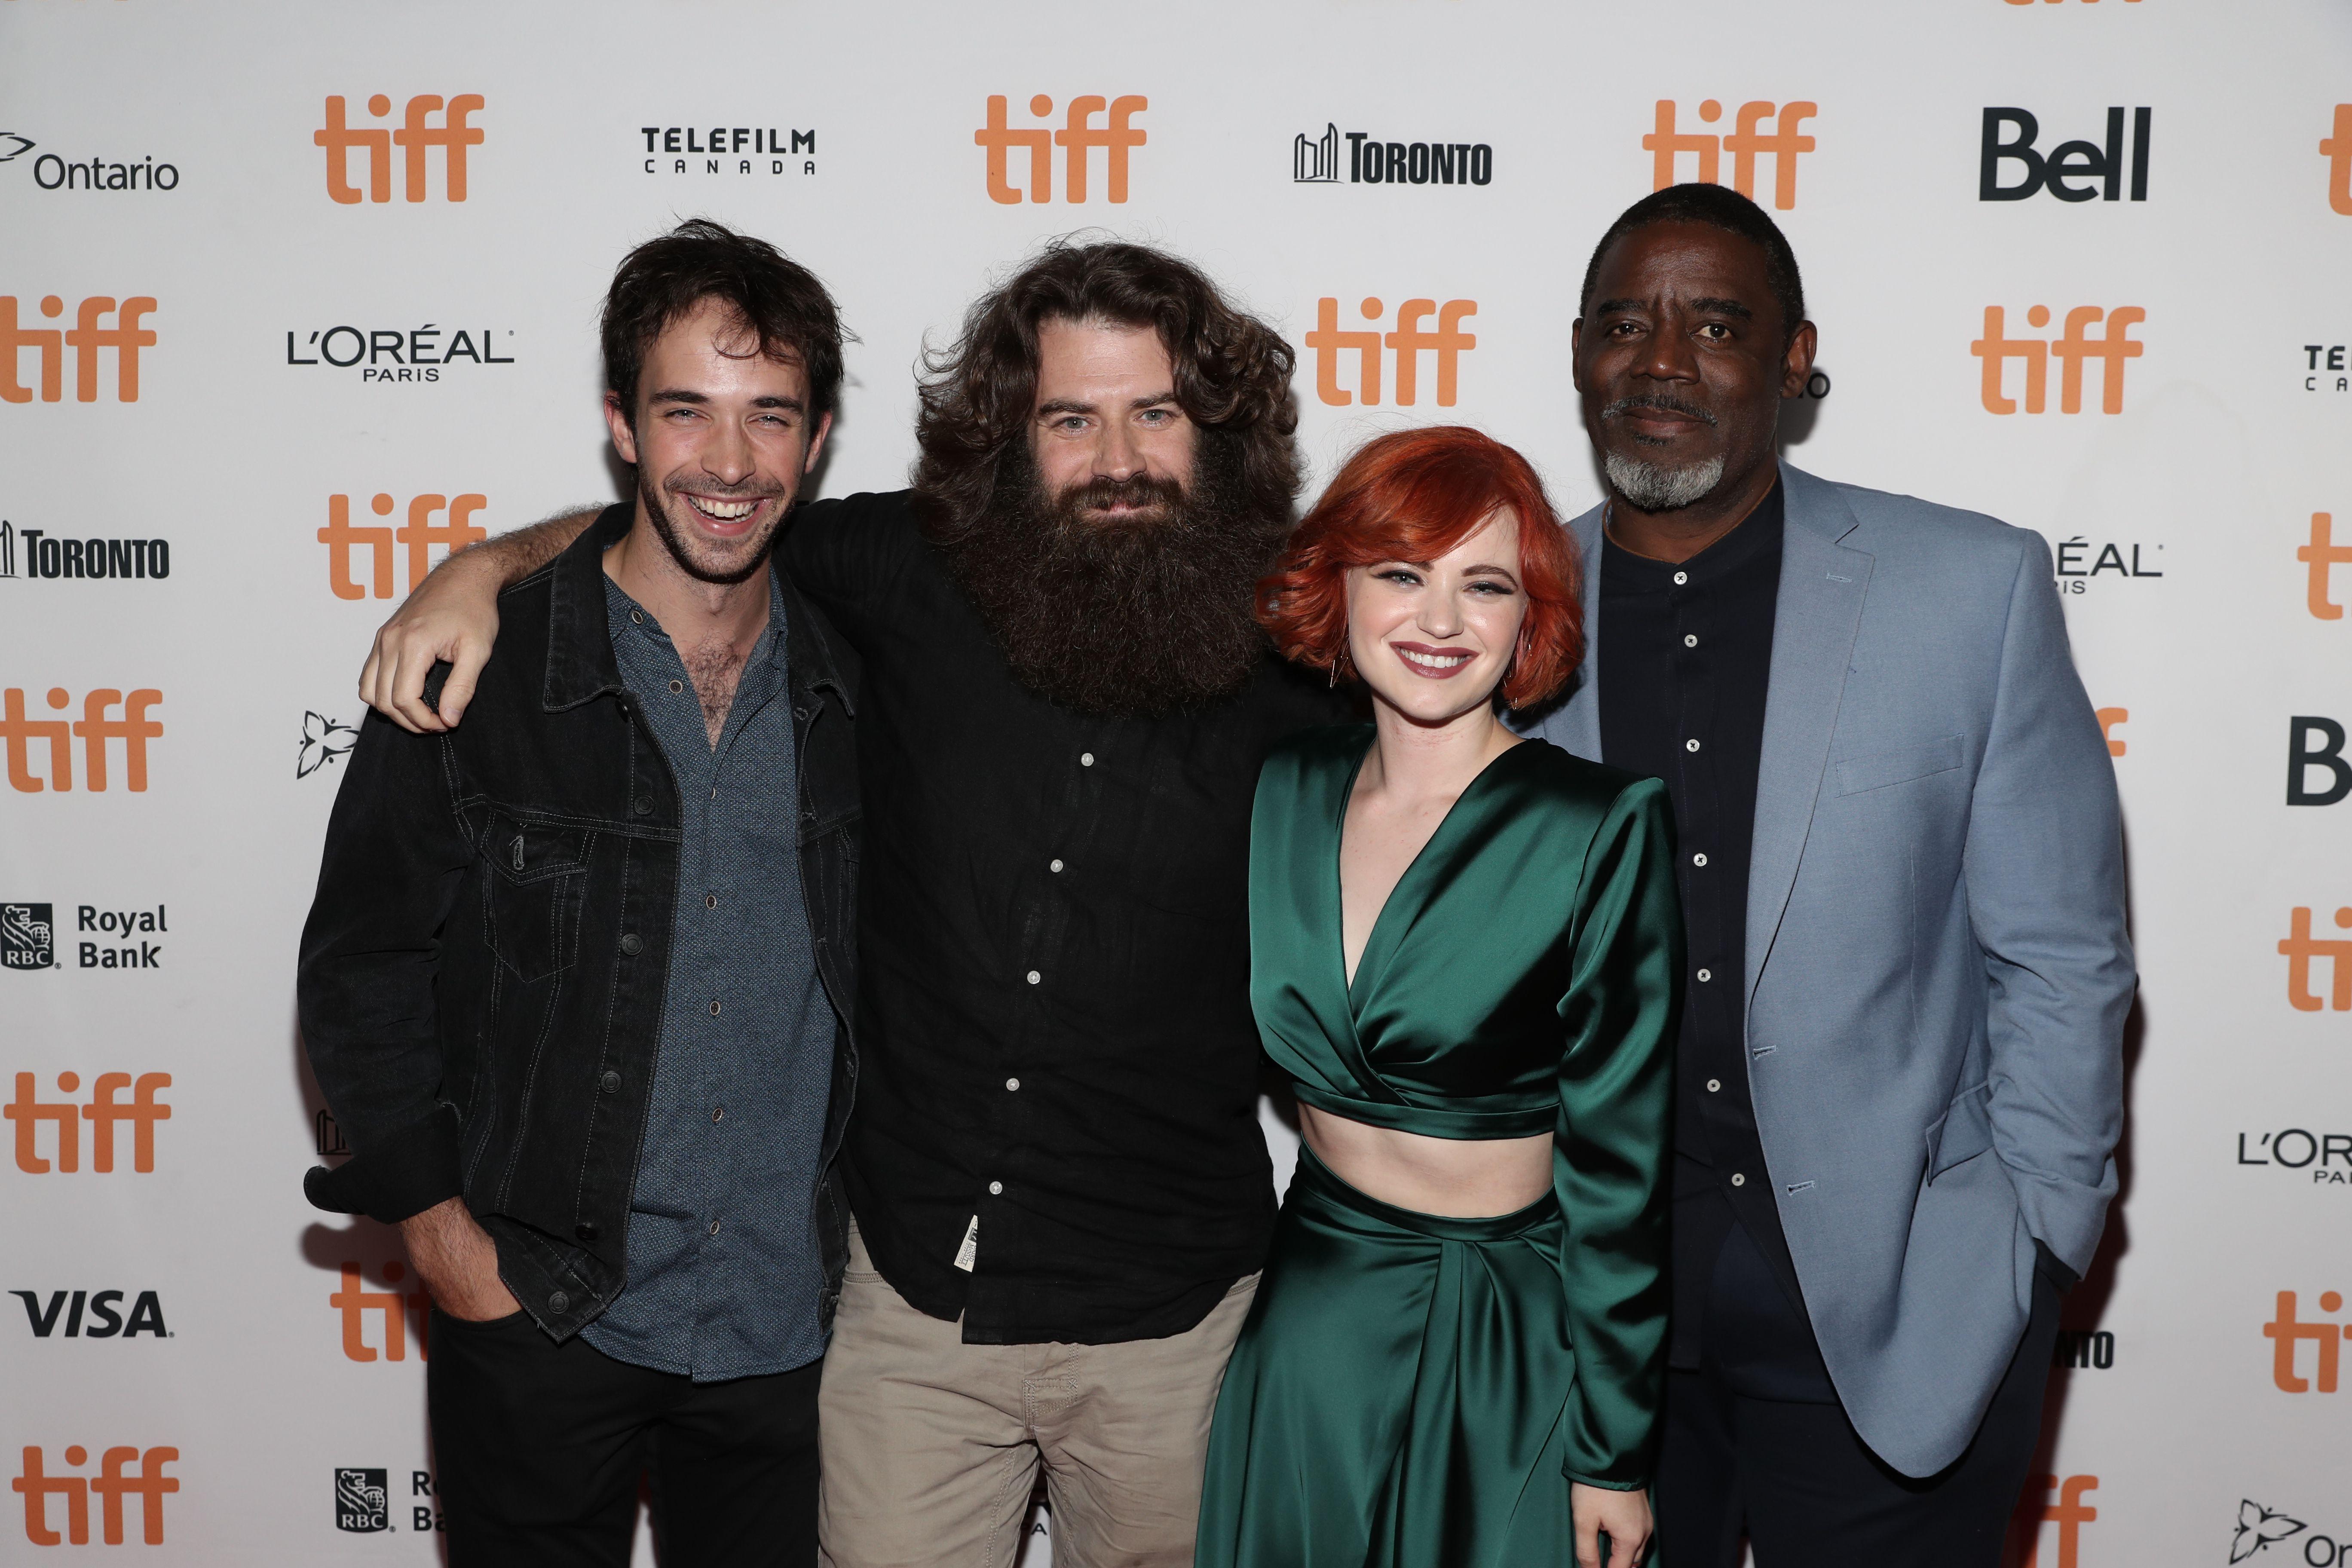 Jake Horowitz, Director Andrew Patterson, Sierra McCormick and Bruce Davis'The Vast of Night' premiere, Arrivals, Toronto International Film Festival, Canada - 12 Sep 2019